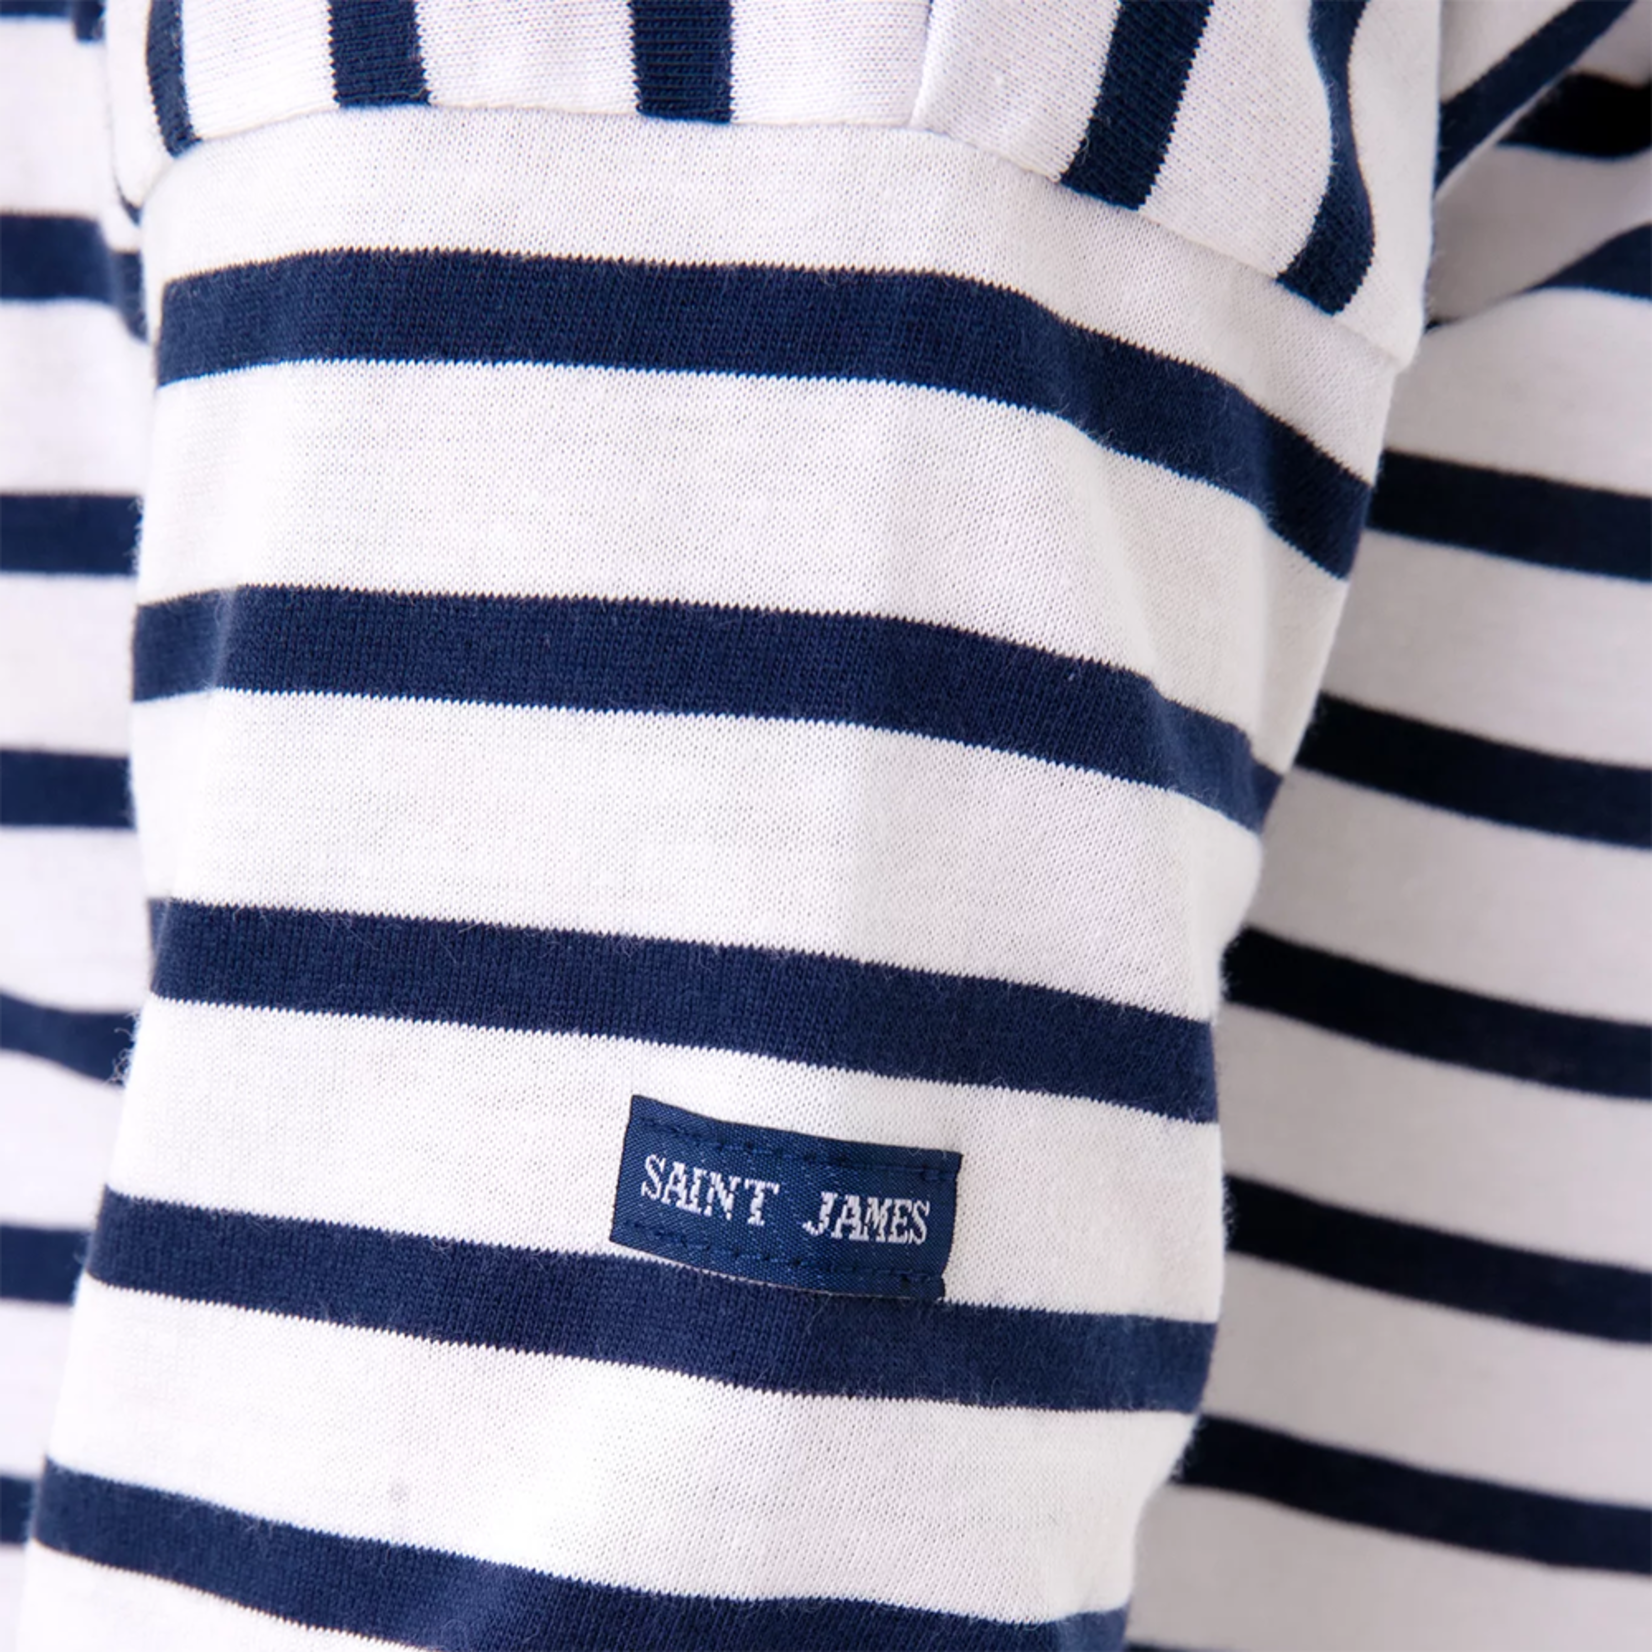 Saint James Minquiers Drop Cotton Shirt